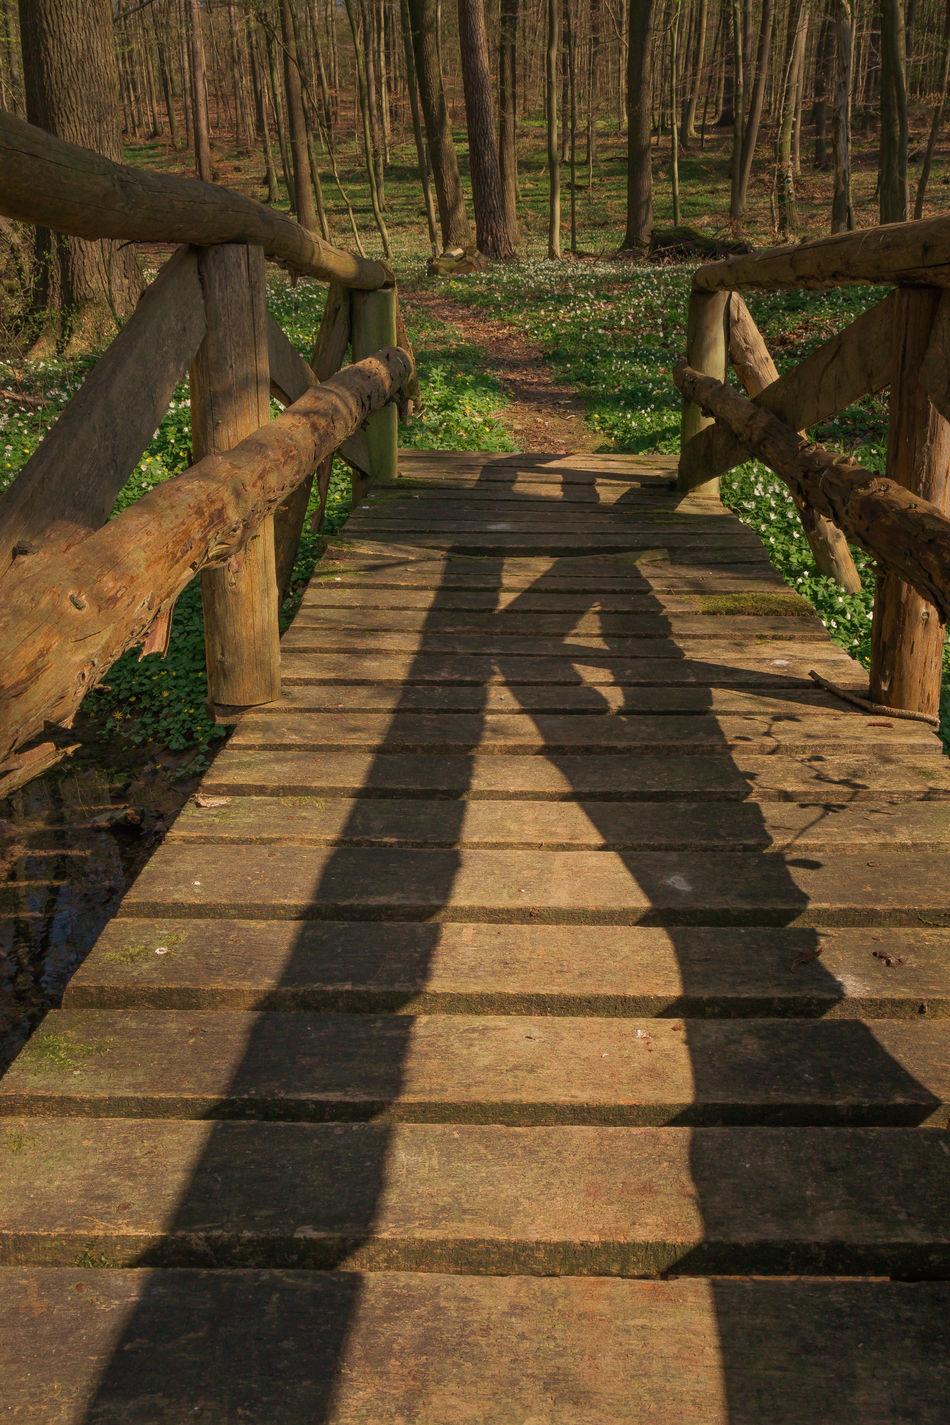 Walk me to the bridge. Anemone Nemorosa Buschwindröschen Day Ficaria Verna Forest Forest Path Lesser Celandine Nature No People Nusshain 04 17 Outdoors Scharbockskraut Shadow Springtime Way Forward Wood - Material Wood Anemone Wooden Bridge